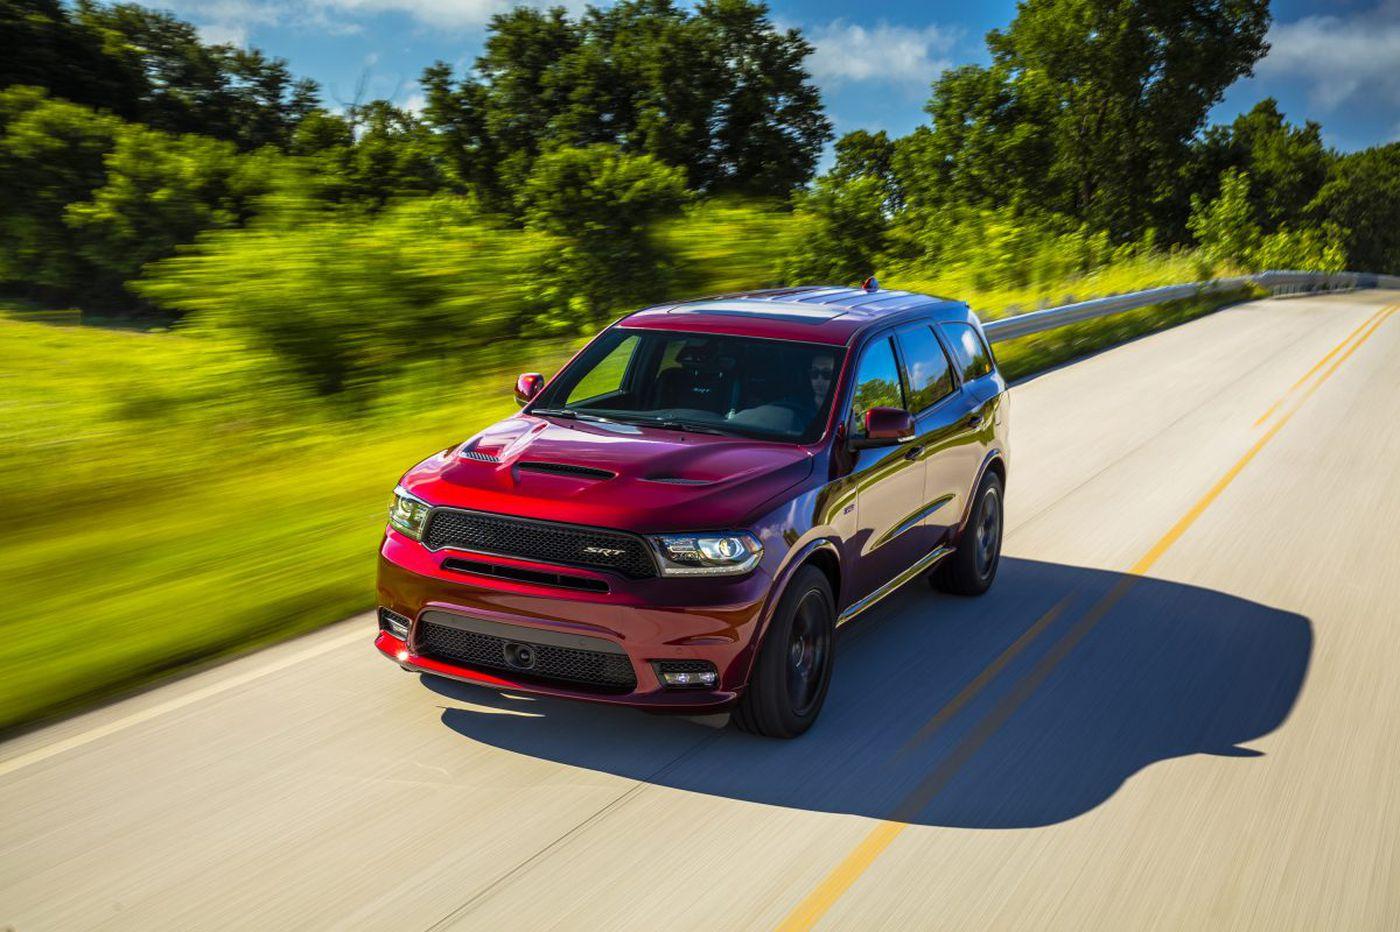 Dodge's Durango SRT offers three rows of performance